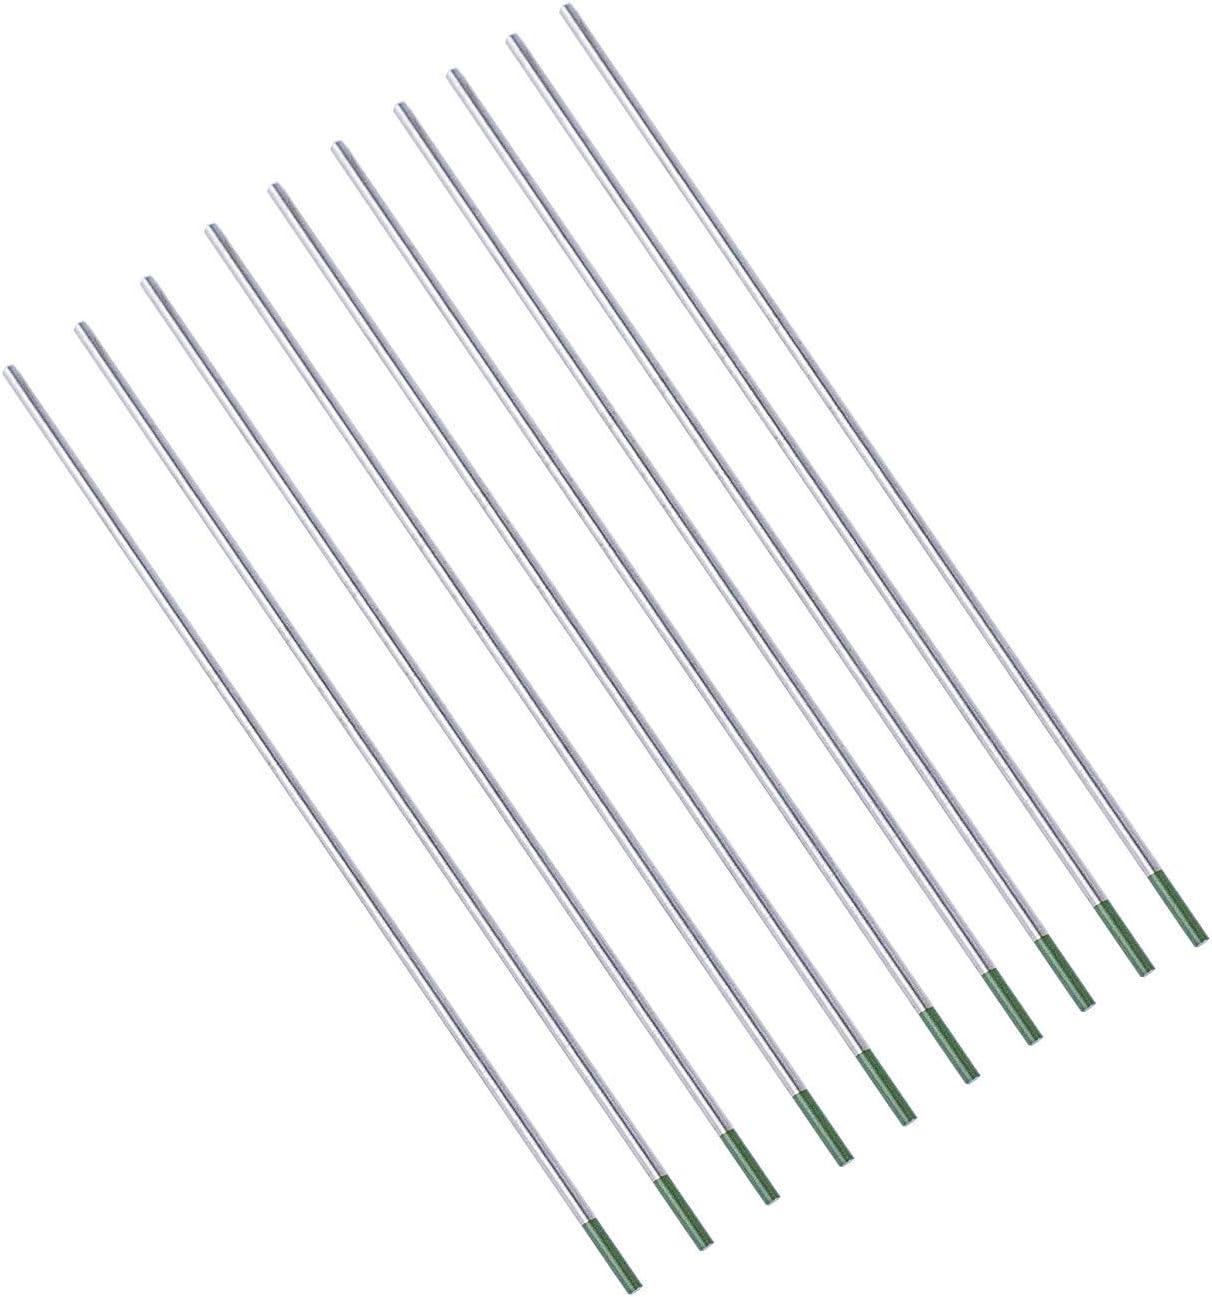 Package of 10 Pieces SenTECH TIG WT20 Welding 1.0 mm x175 mm Tungsten Electrodes Thorium 2/% Thorium Tungsten Electrode red